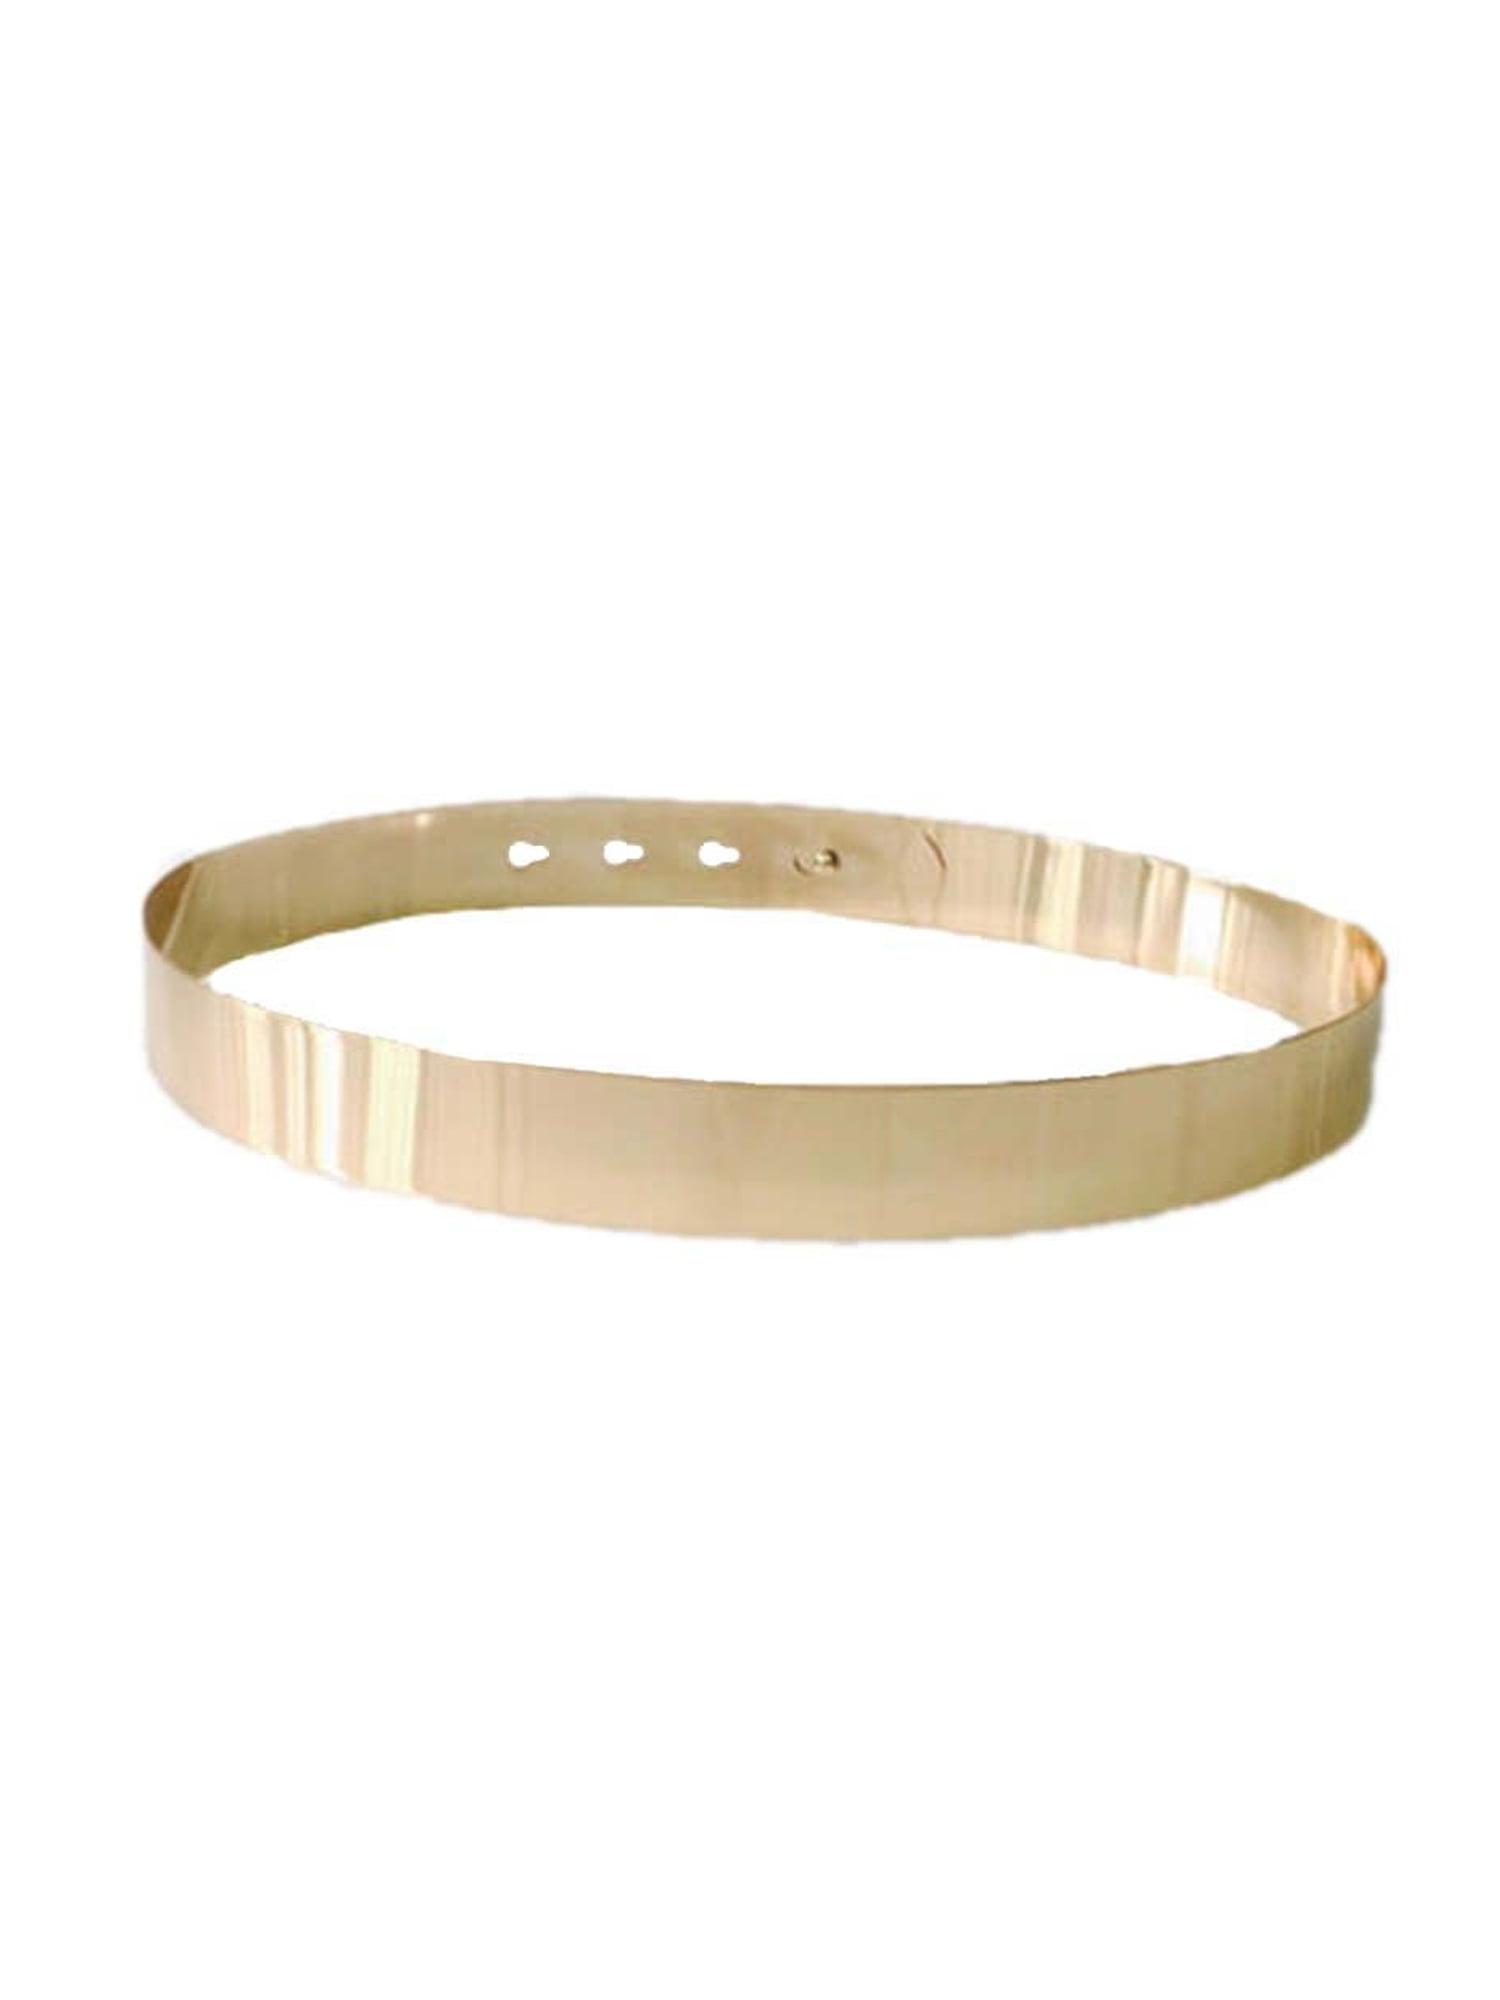 Women/'s Elastic Metal Waist Belt Metallic Bling Gold Plate slim Simple Band SO